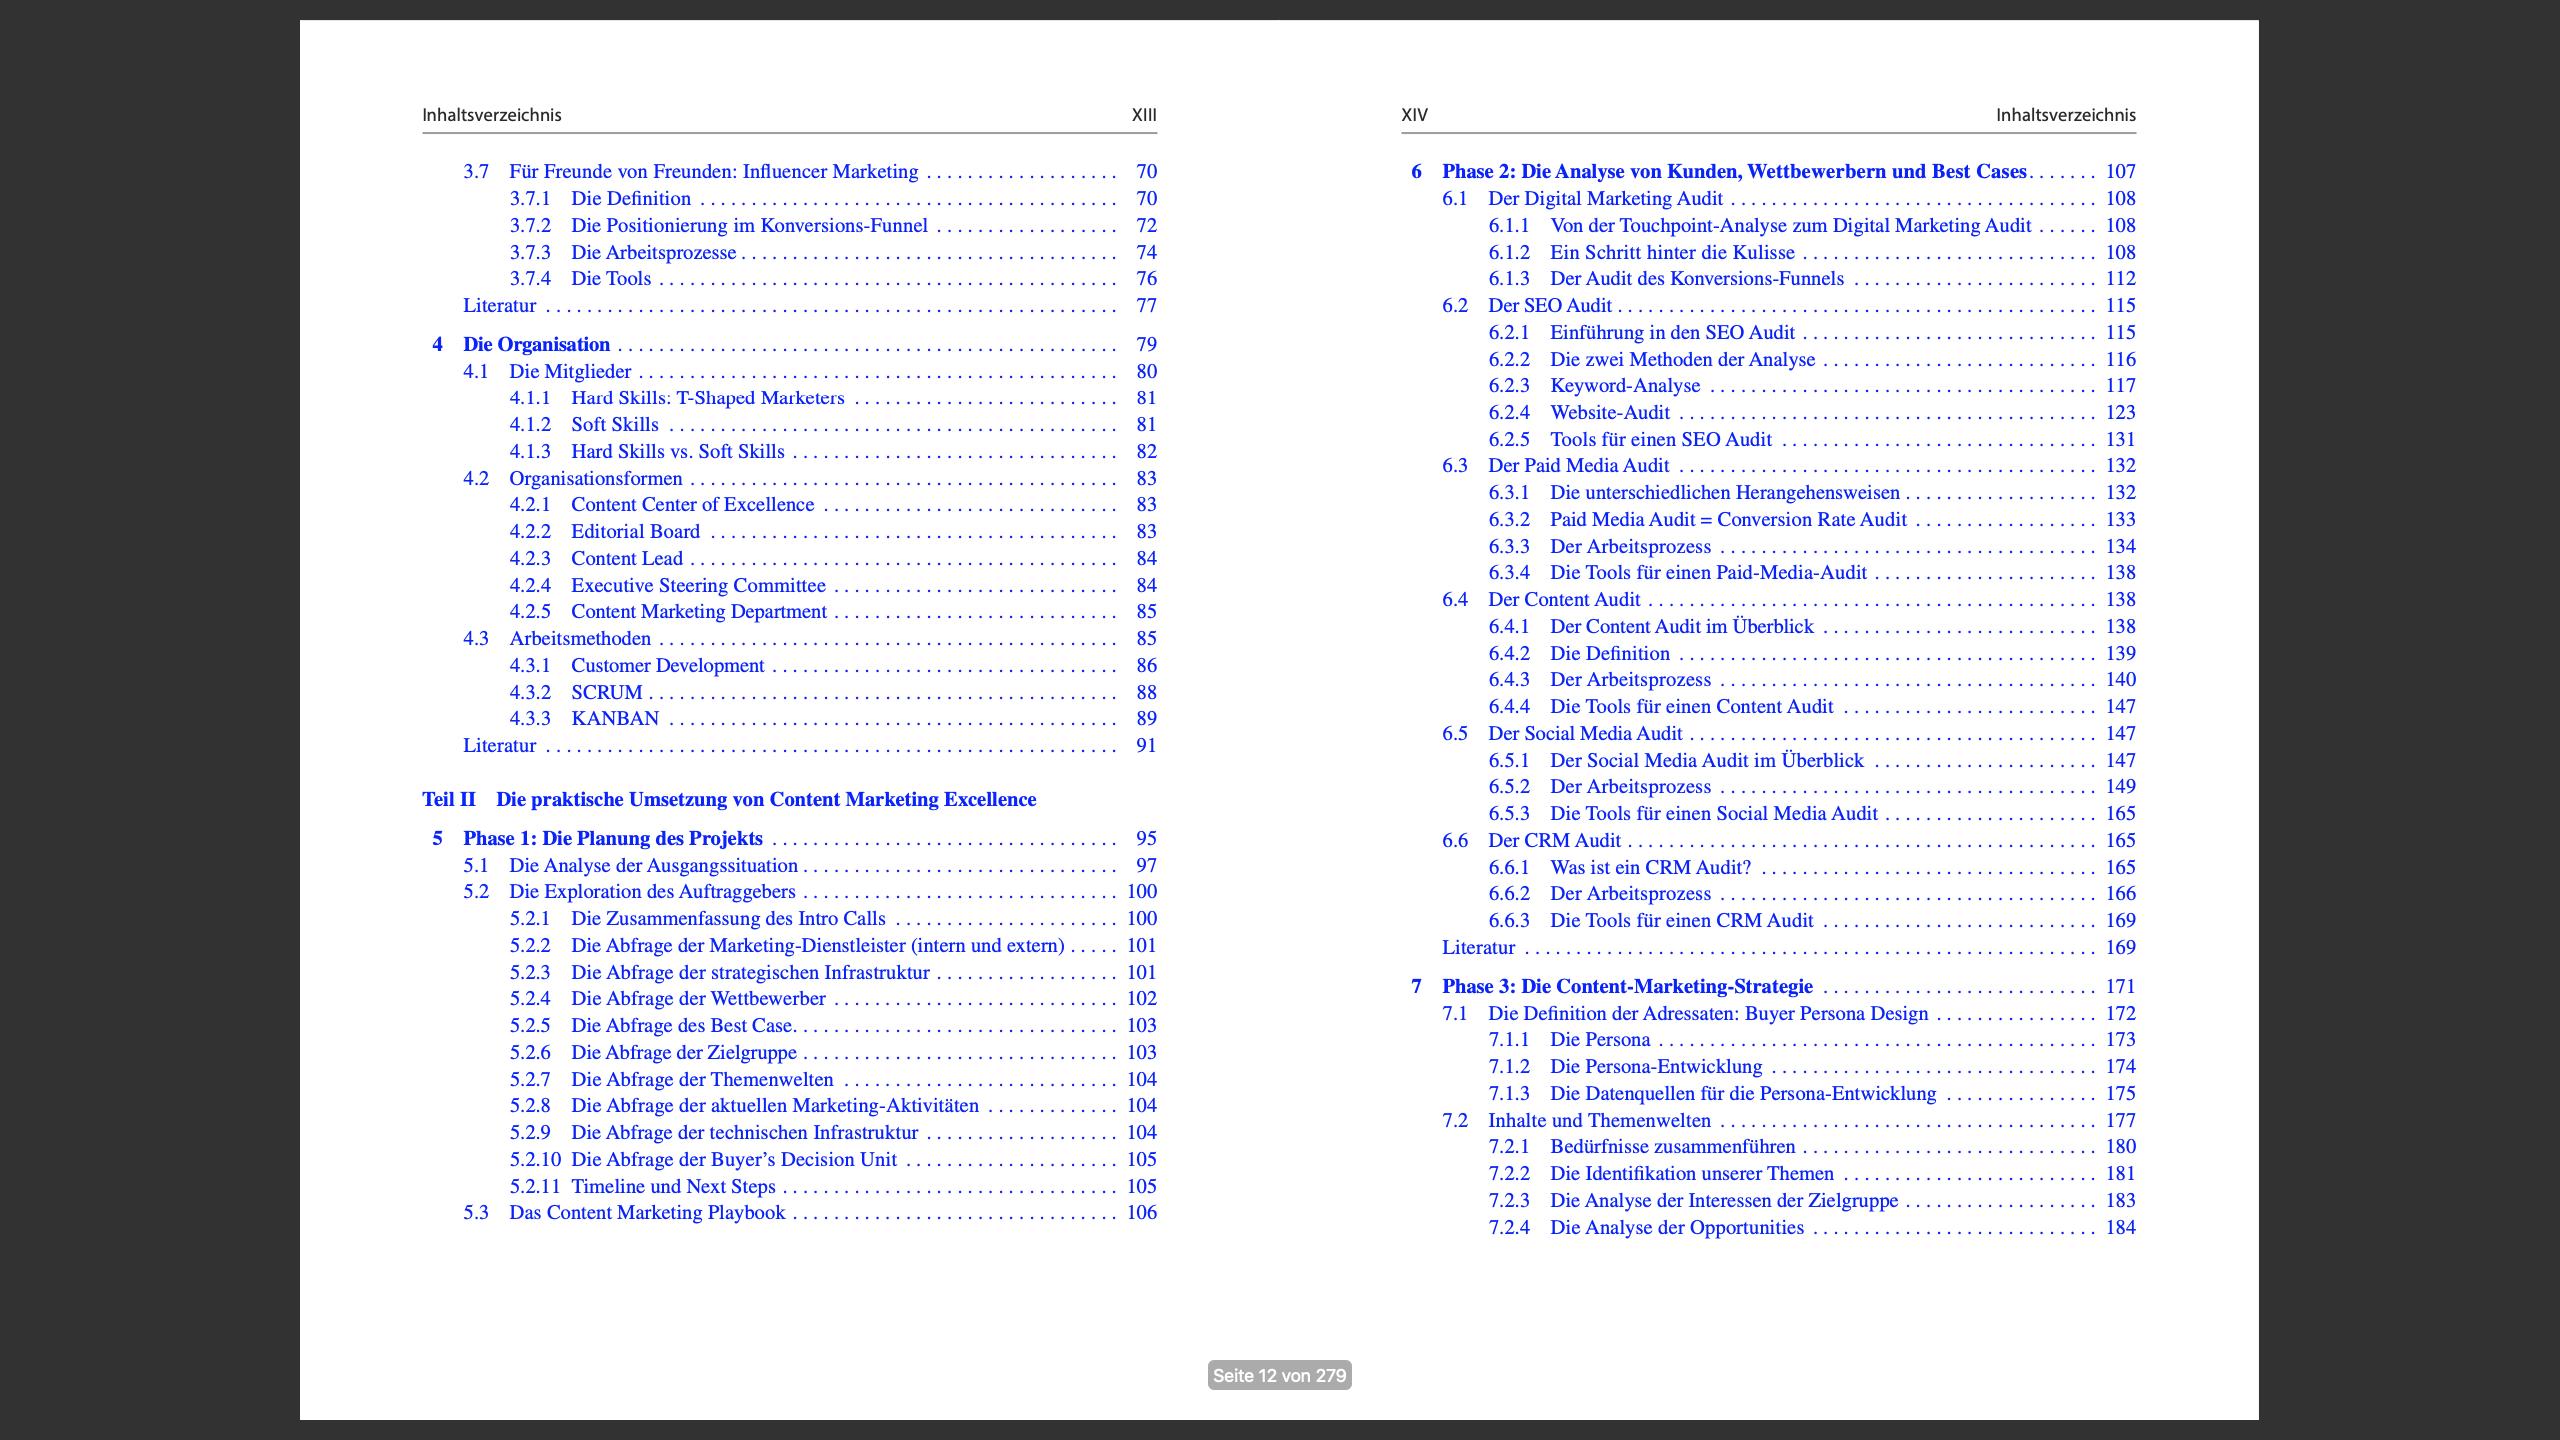 2-Methodisches-Content-Marketing-Gerrit-Grunert